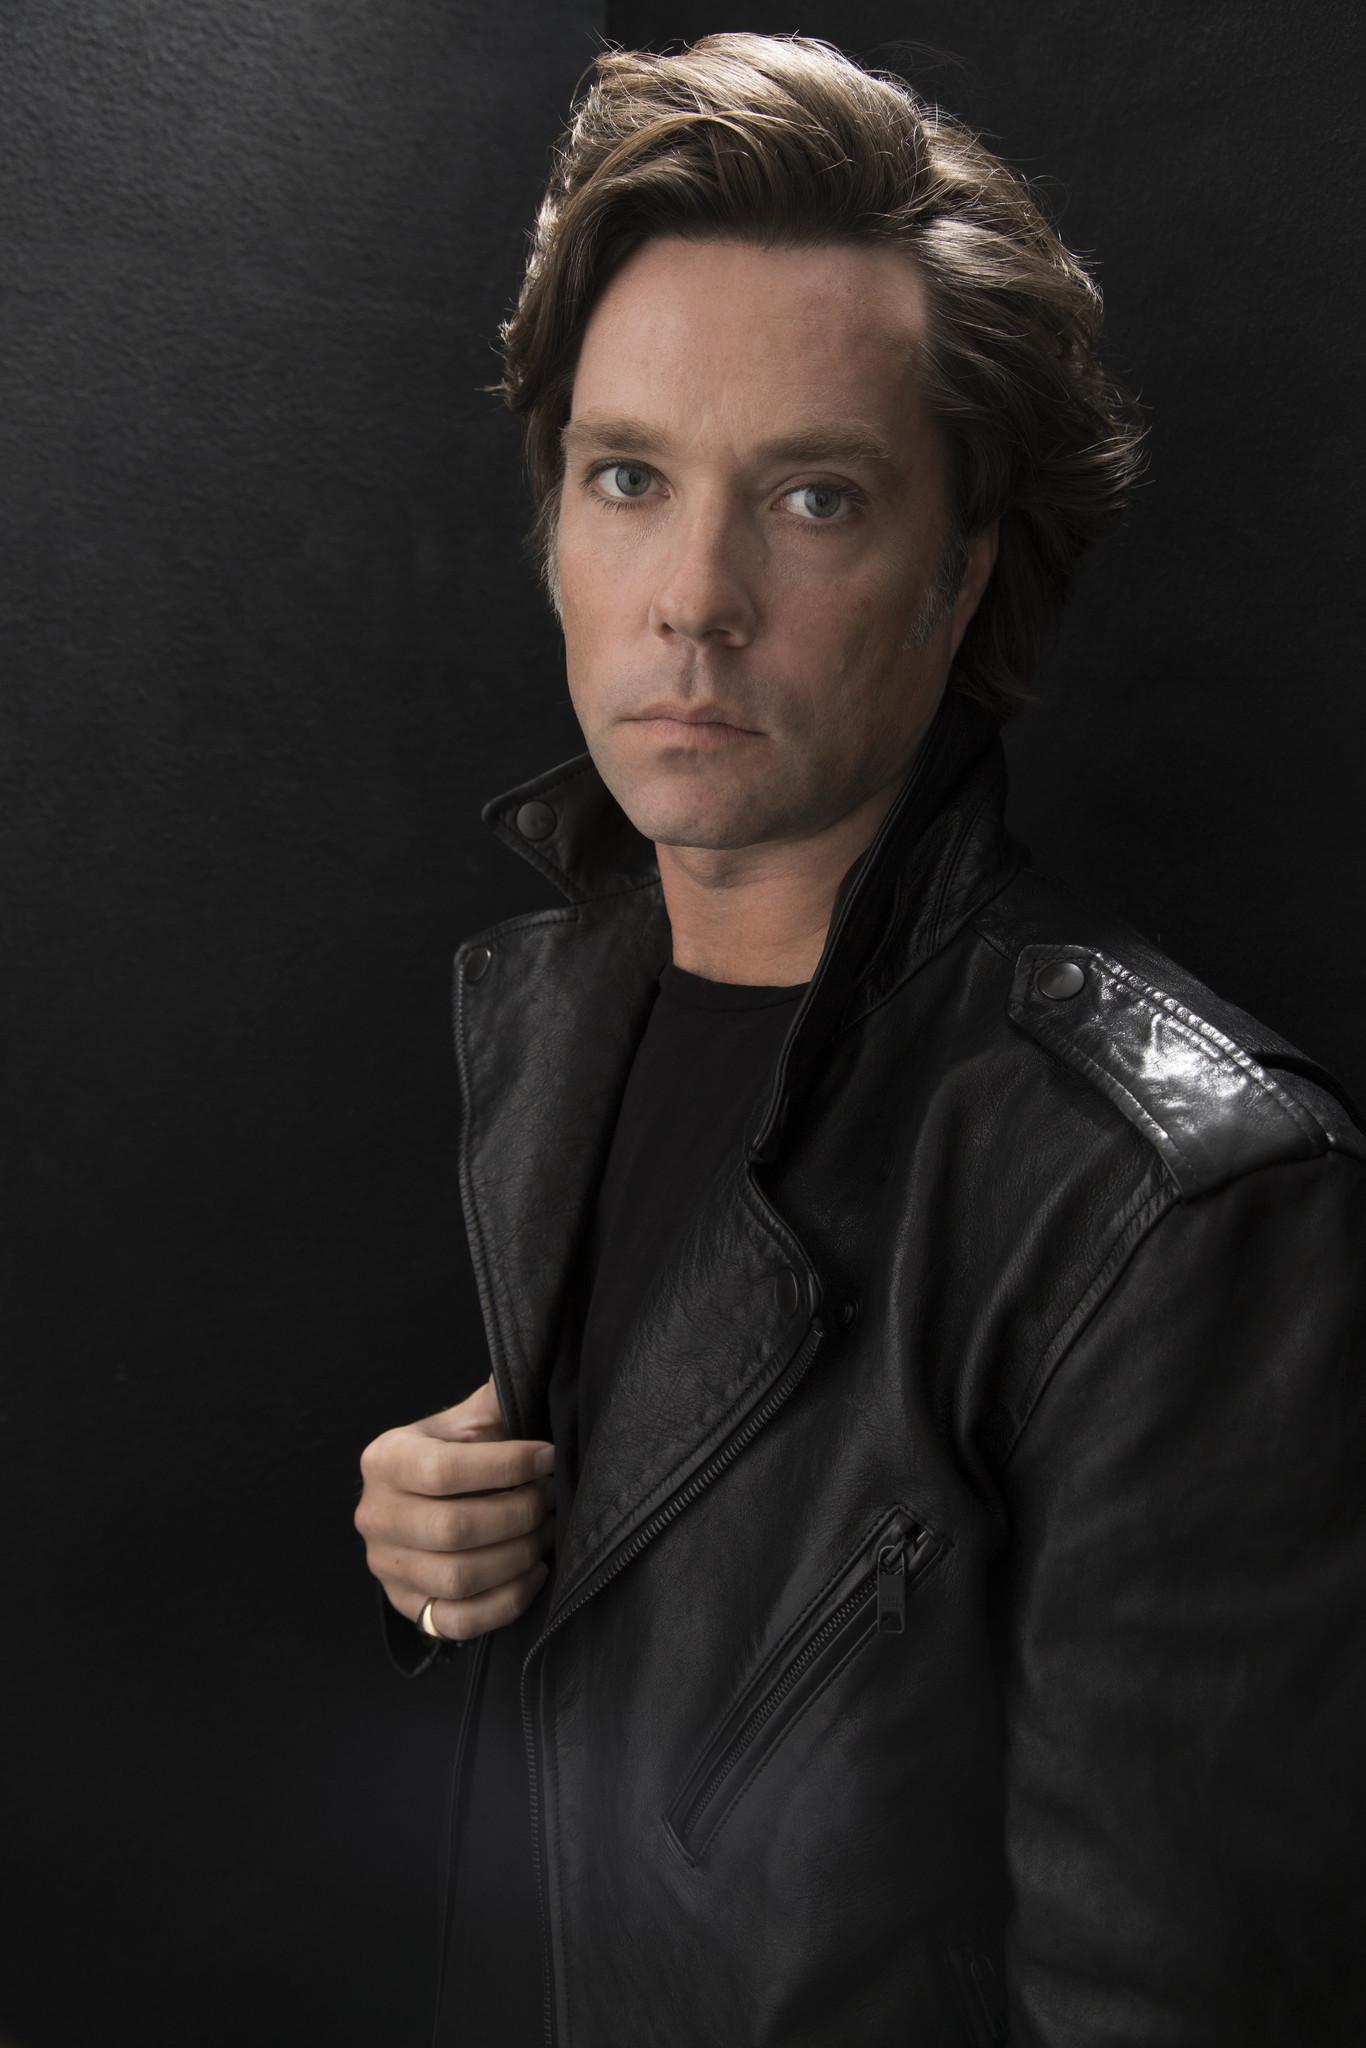 Vocalist Rufus Wainwright